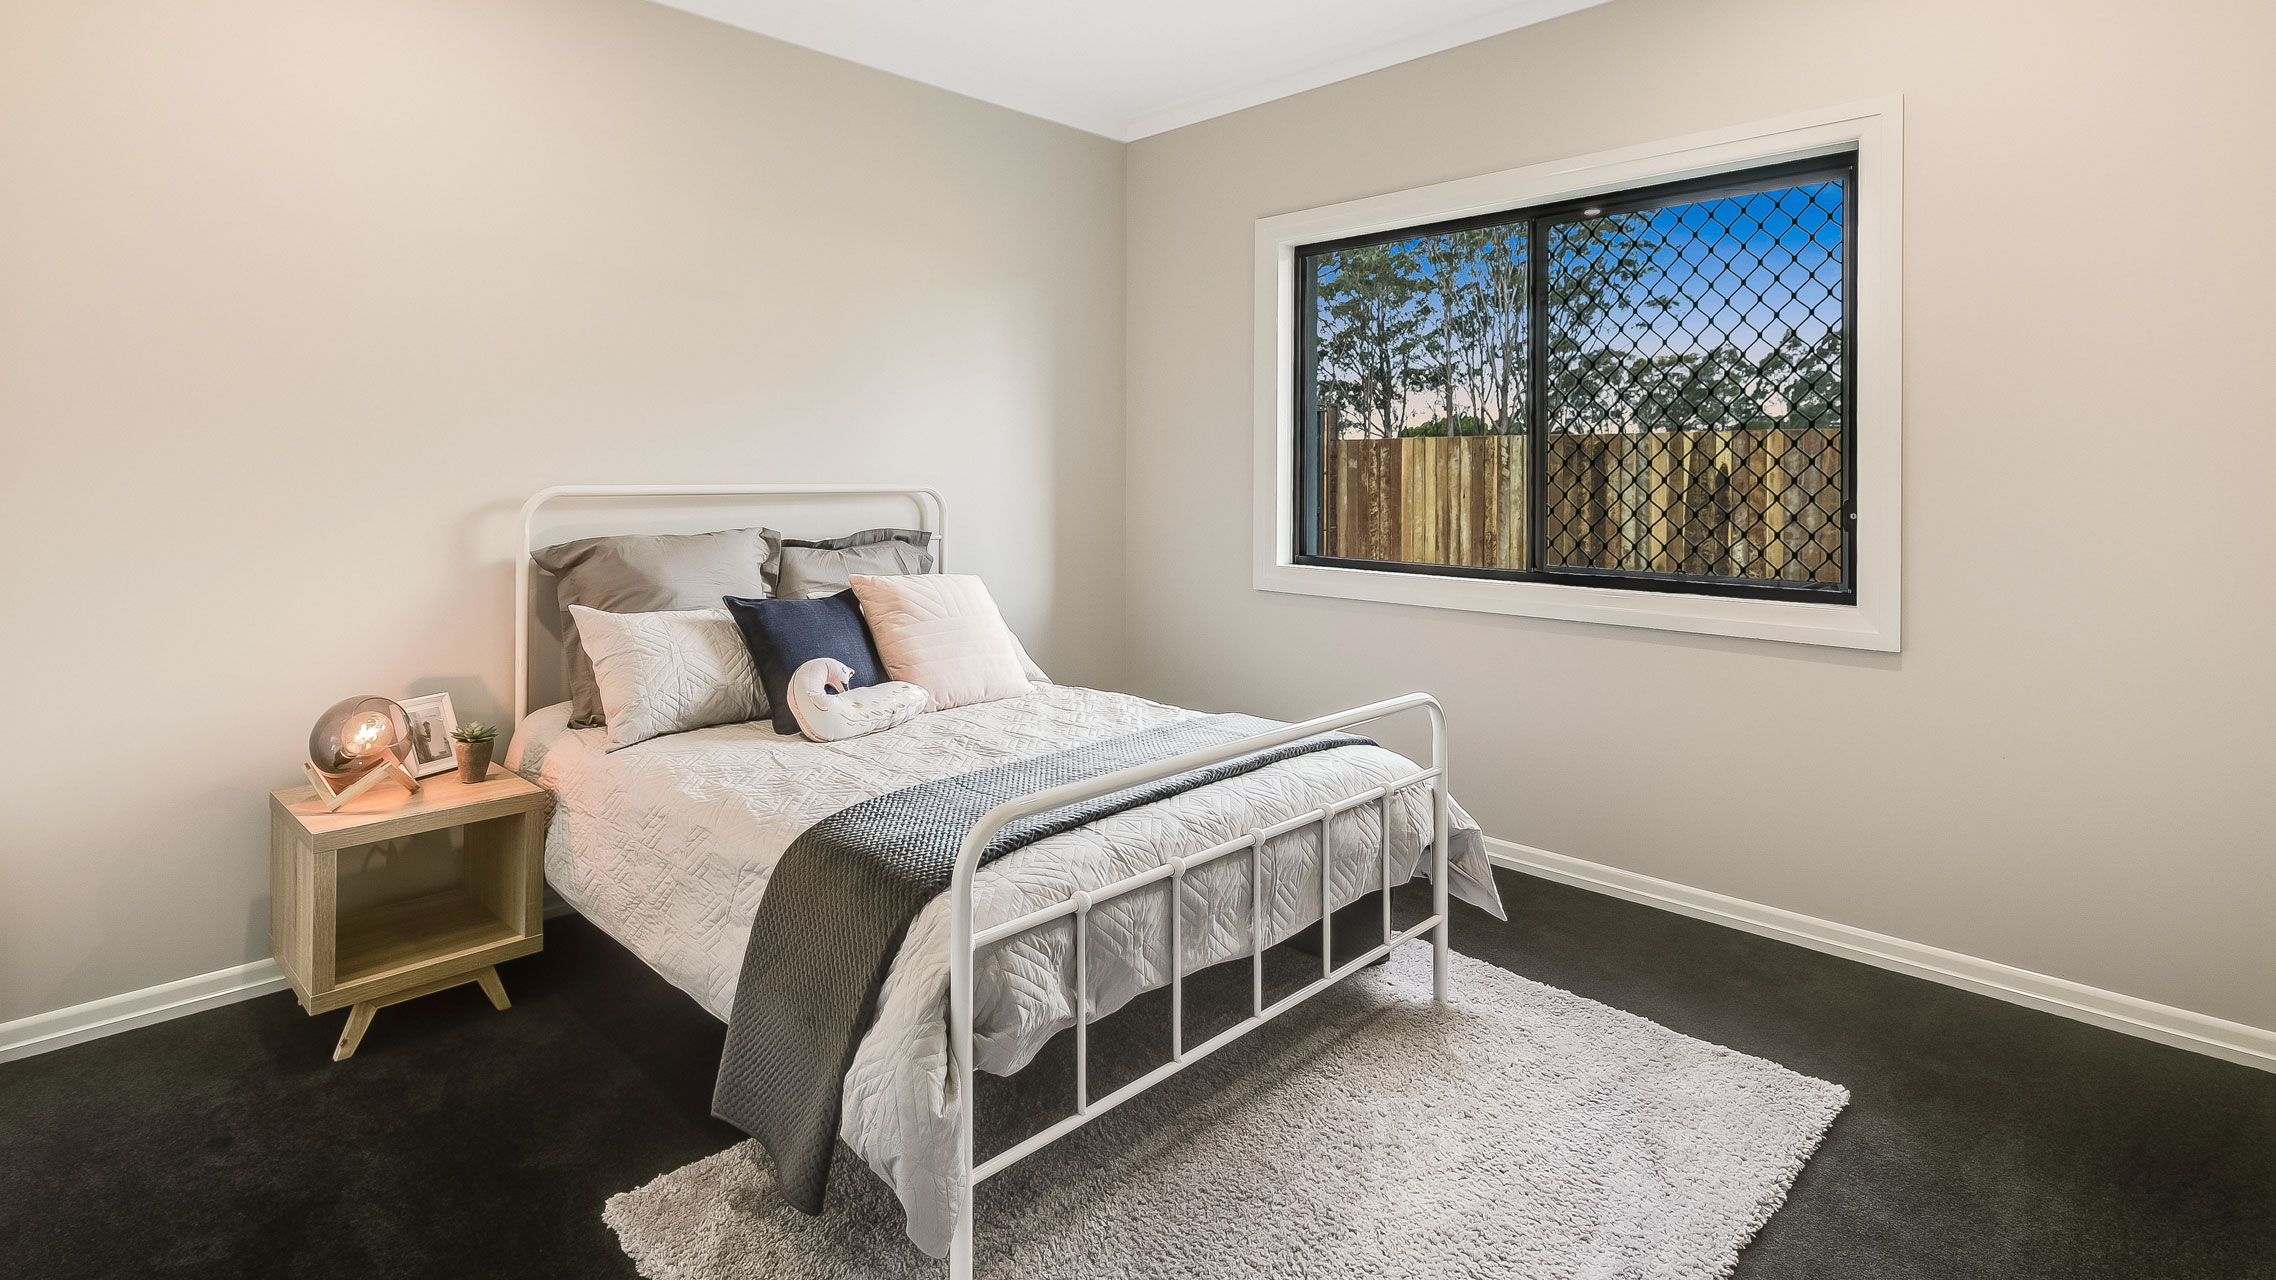 Black Window Safety Screen in bedroom